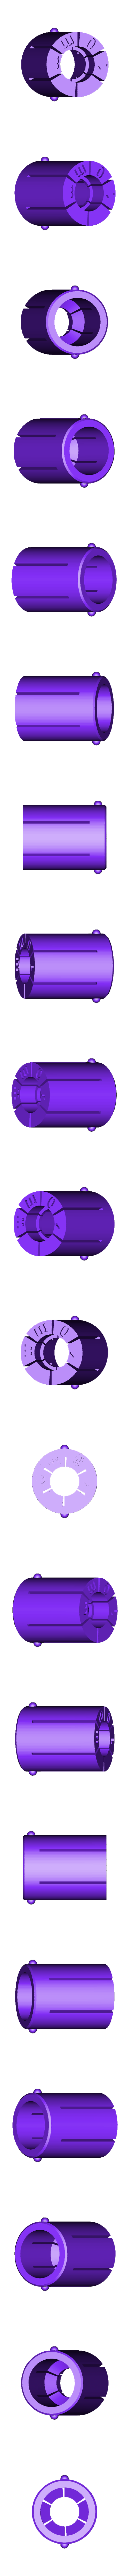 insert10mm.small.stl Download free STL file Bullet puller • 3D printable design, LionFox